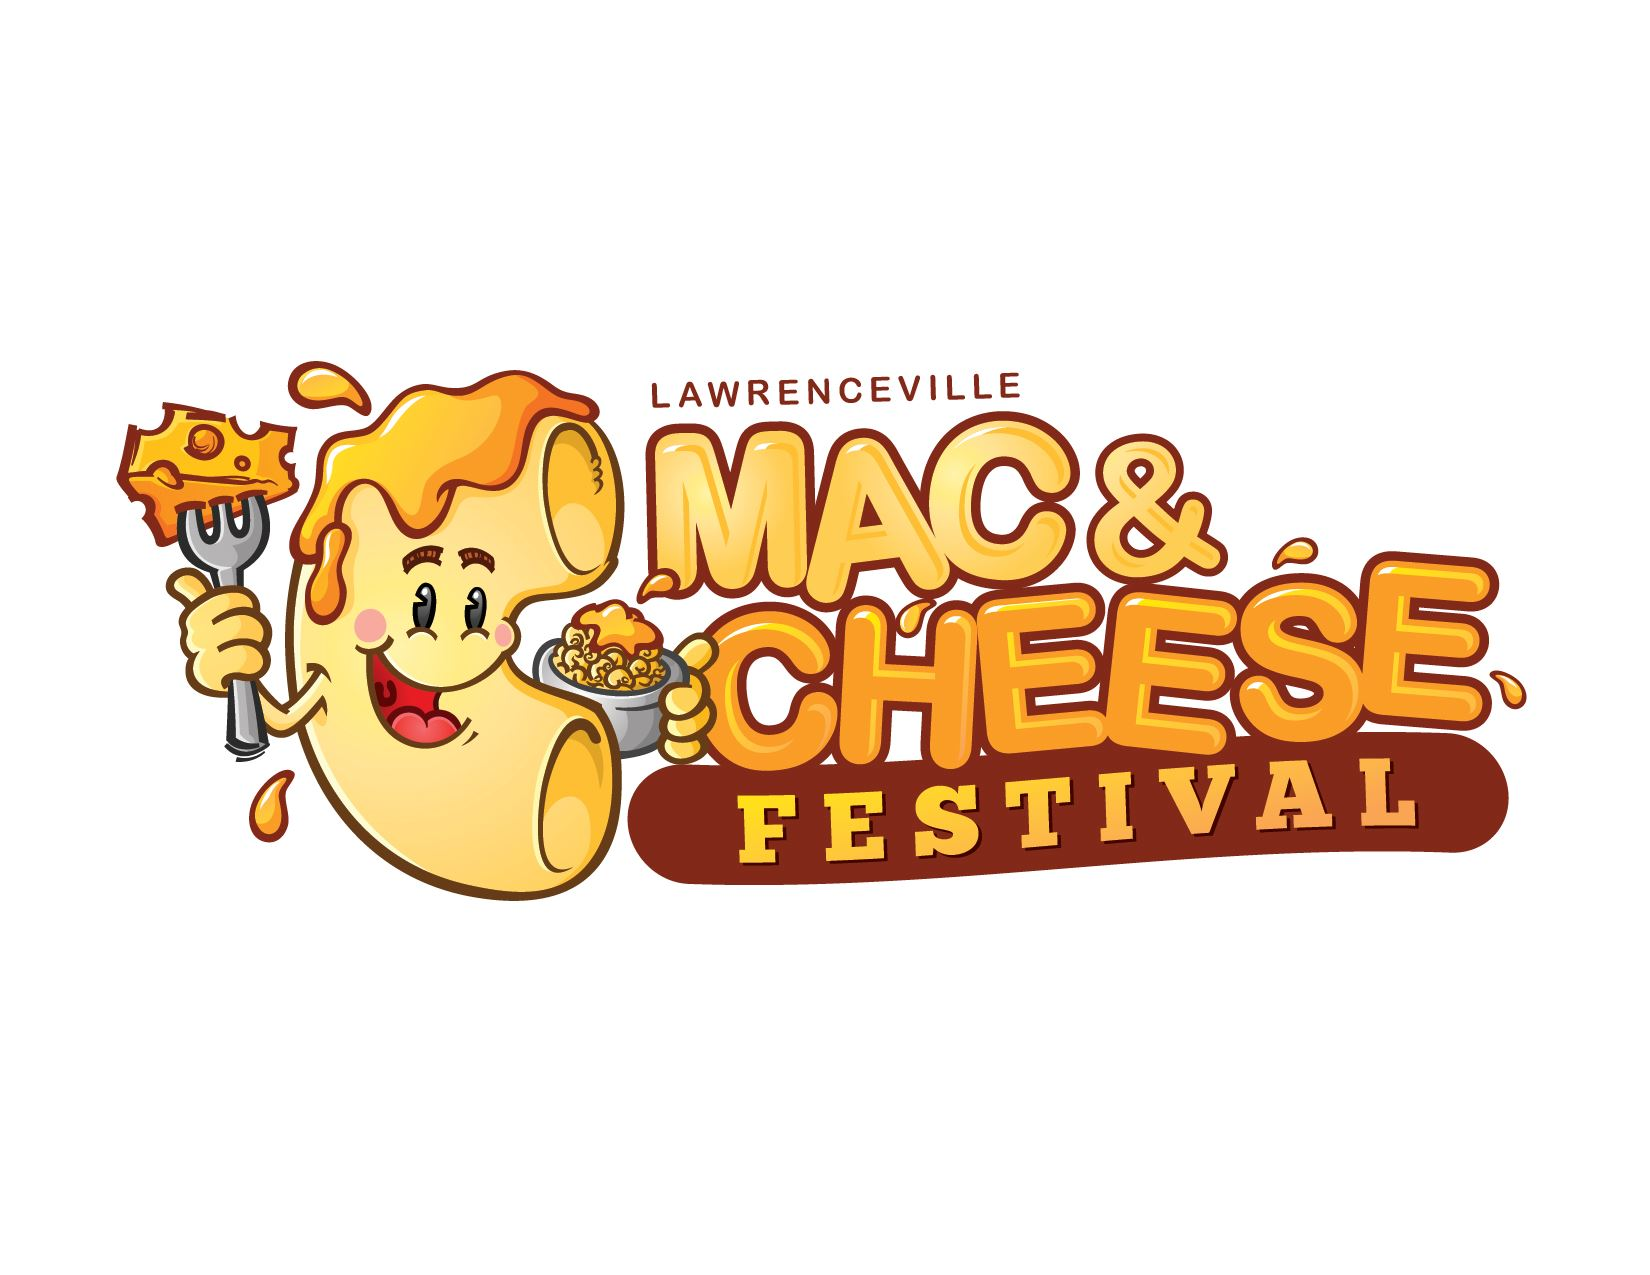 周末活动 | MAC & CHEESE FEST